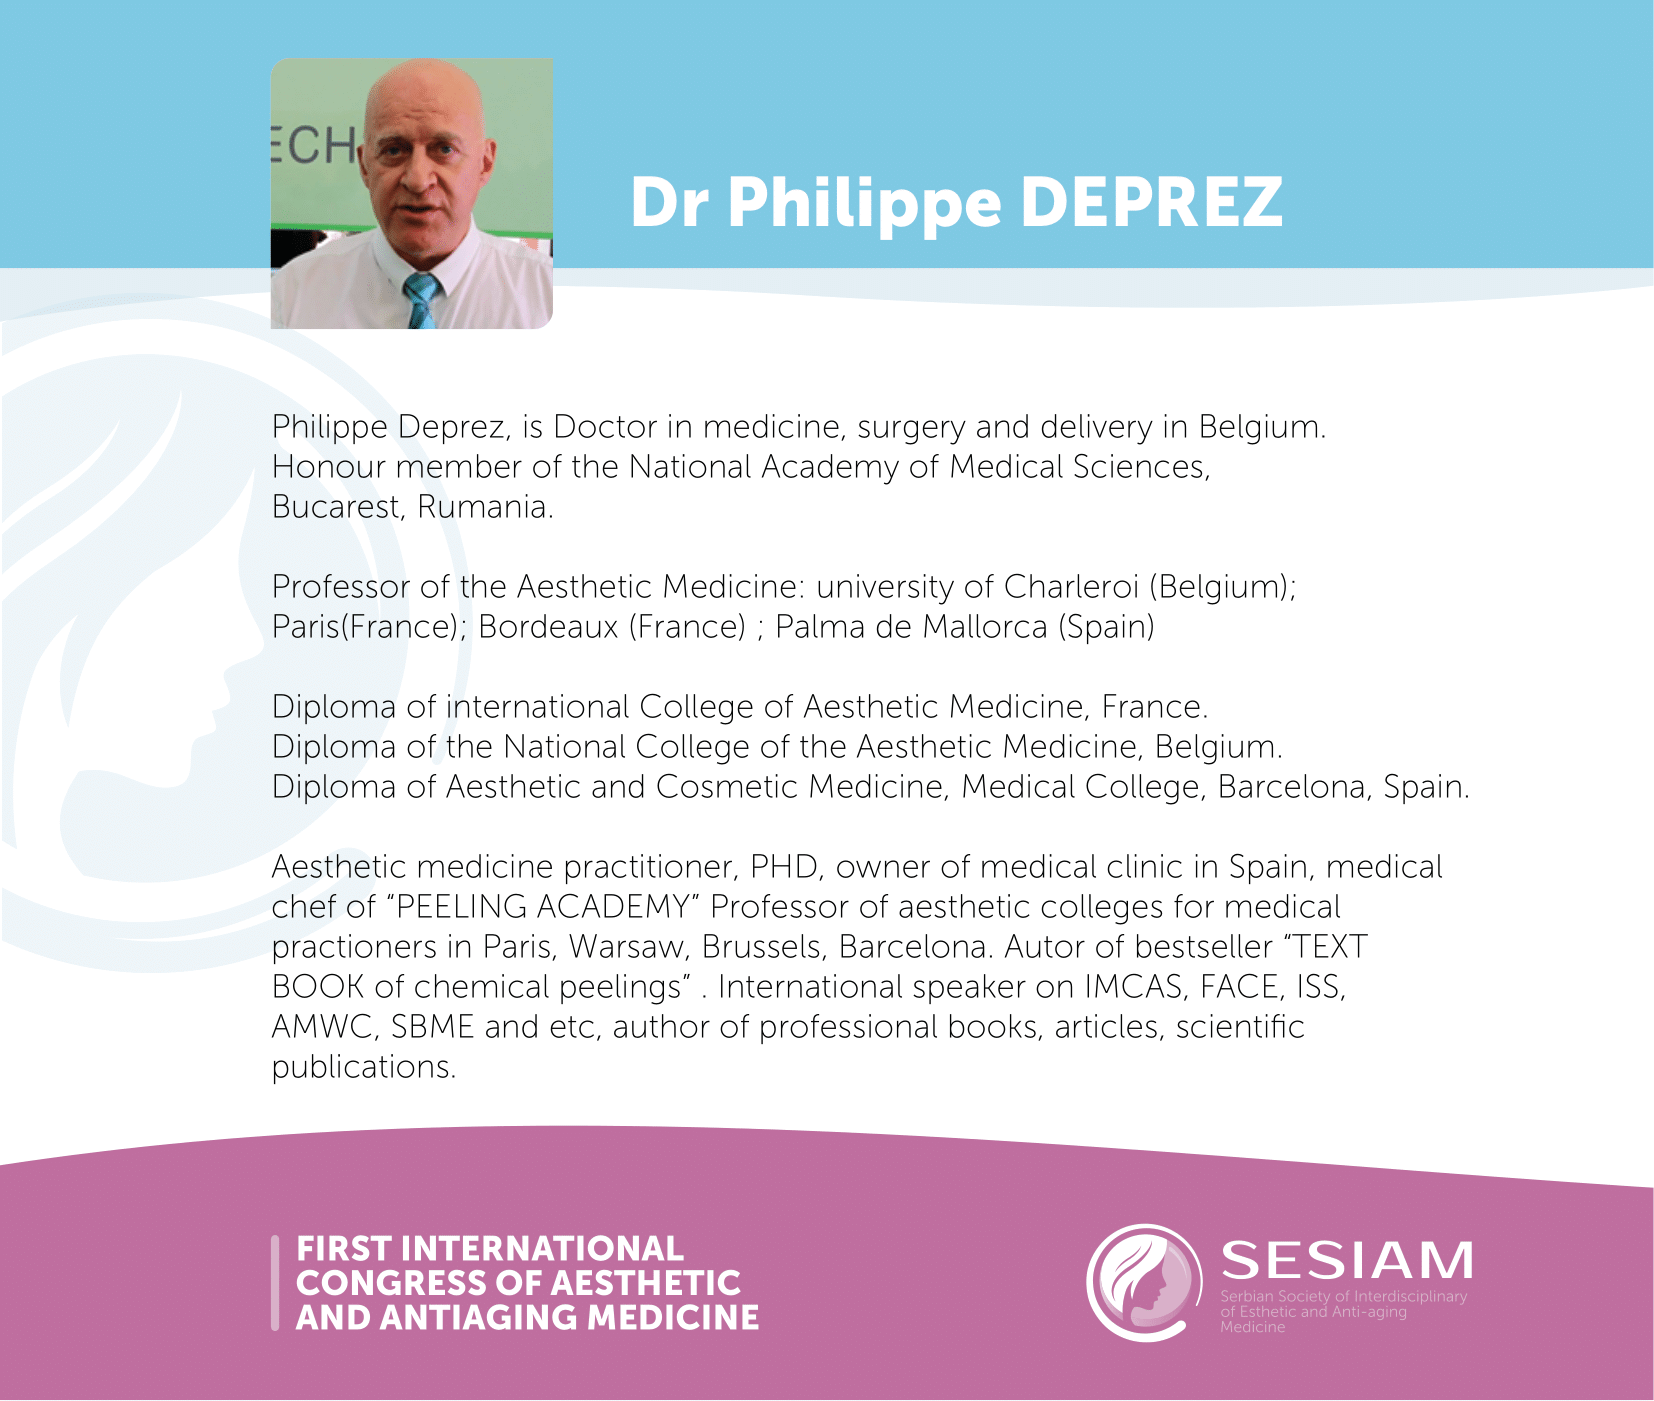 Dr Philippe Deprez